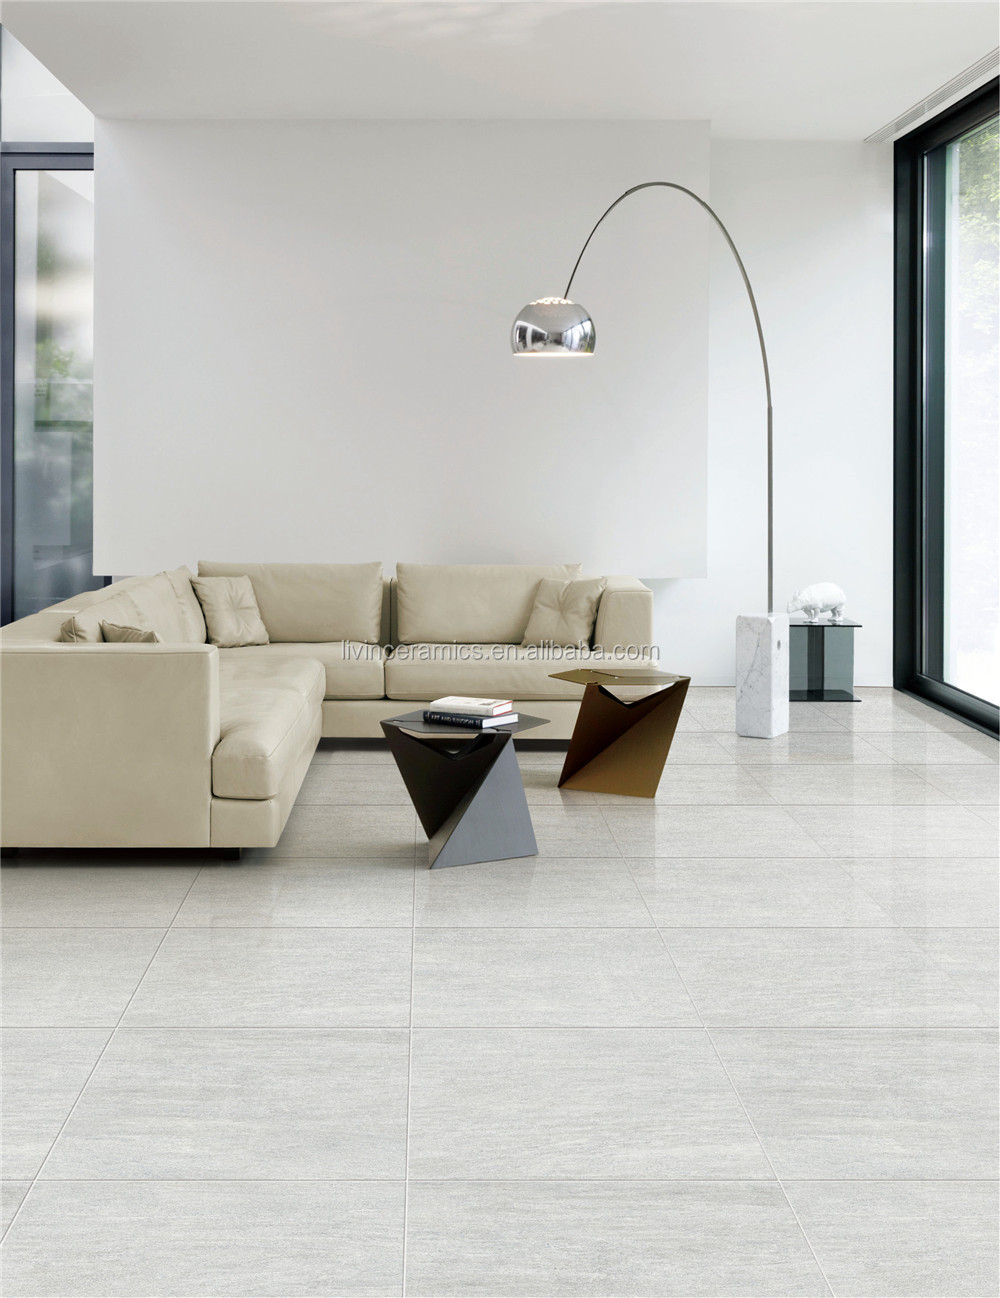 Simple design porcelain tile discontinued floor tile floor tile simple design porcelain tile discontinued floor tile floor tile lvf6636 dailygadgetfo Image collections